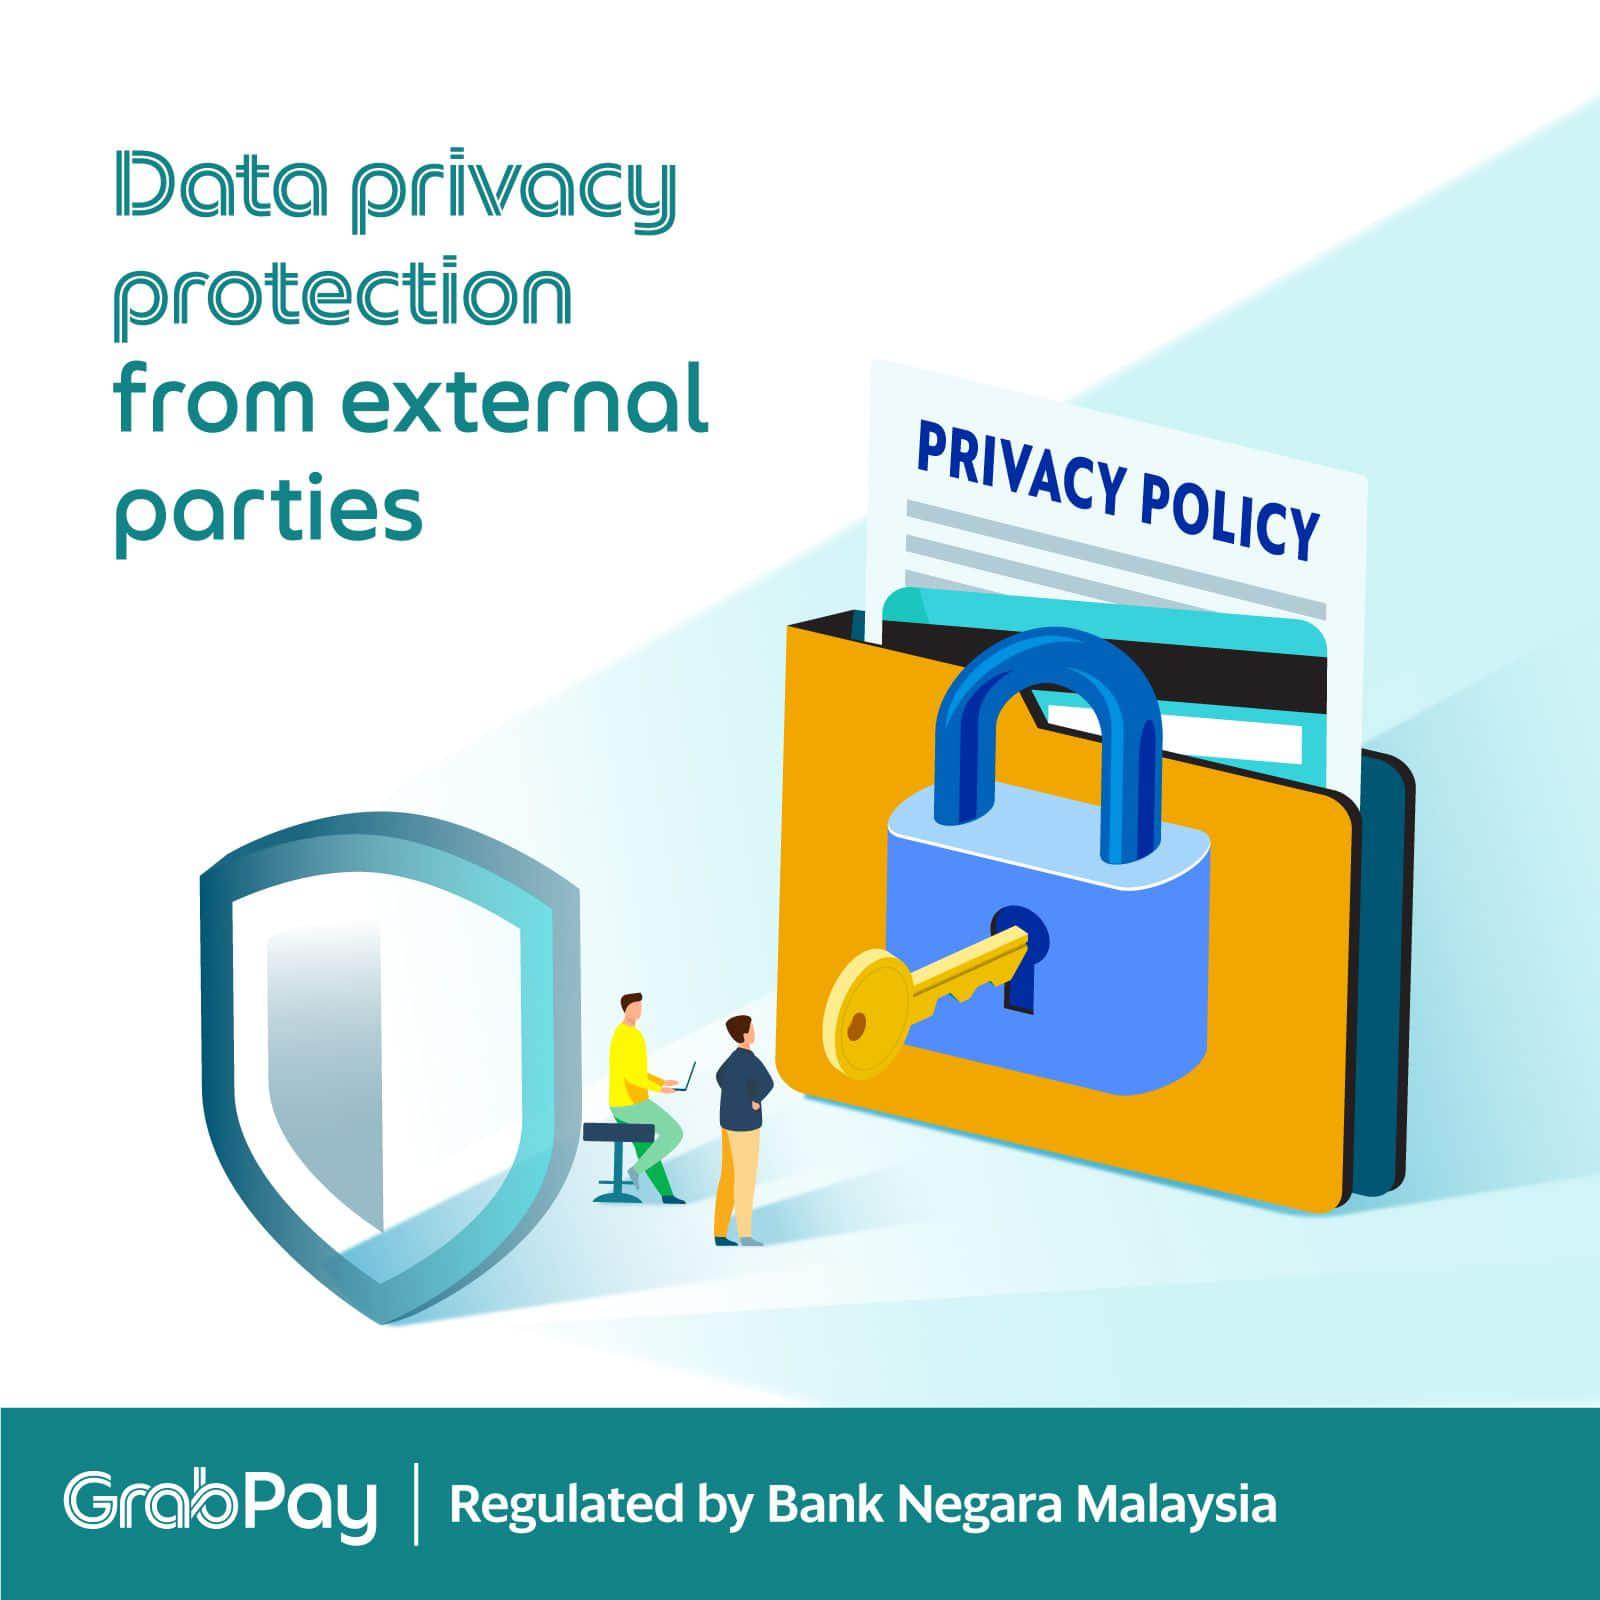 Carousel-3-Data-privacy